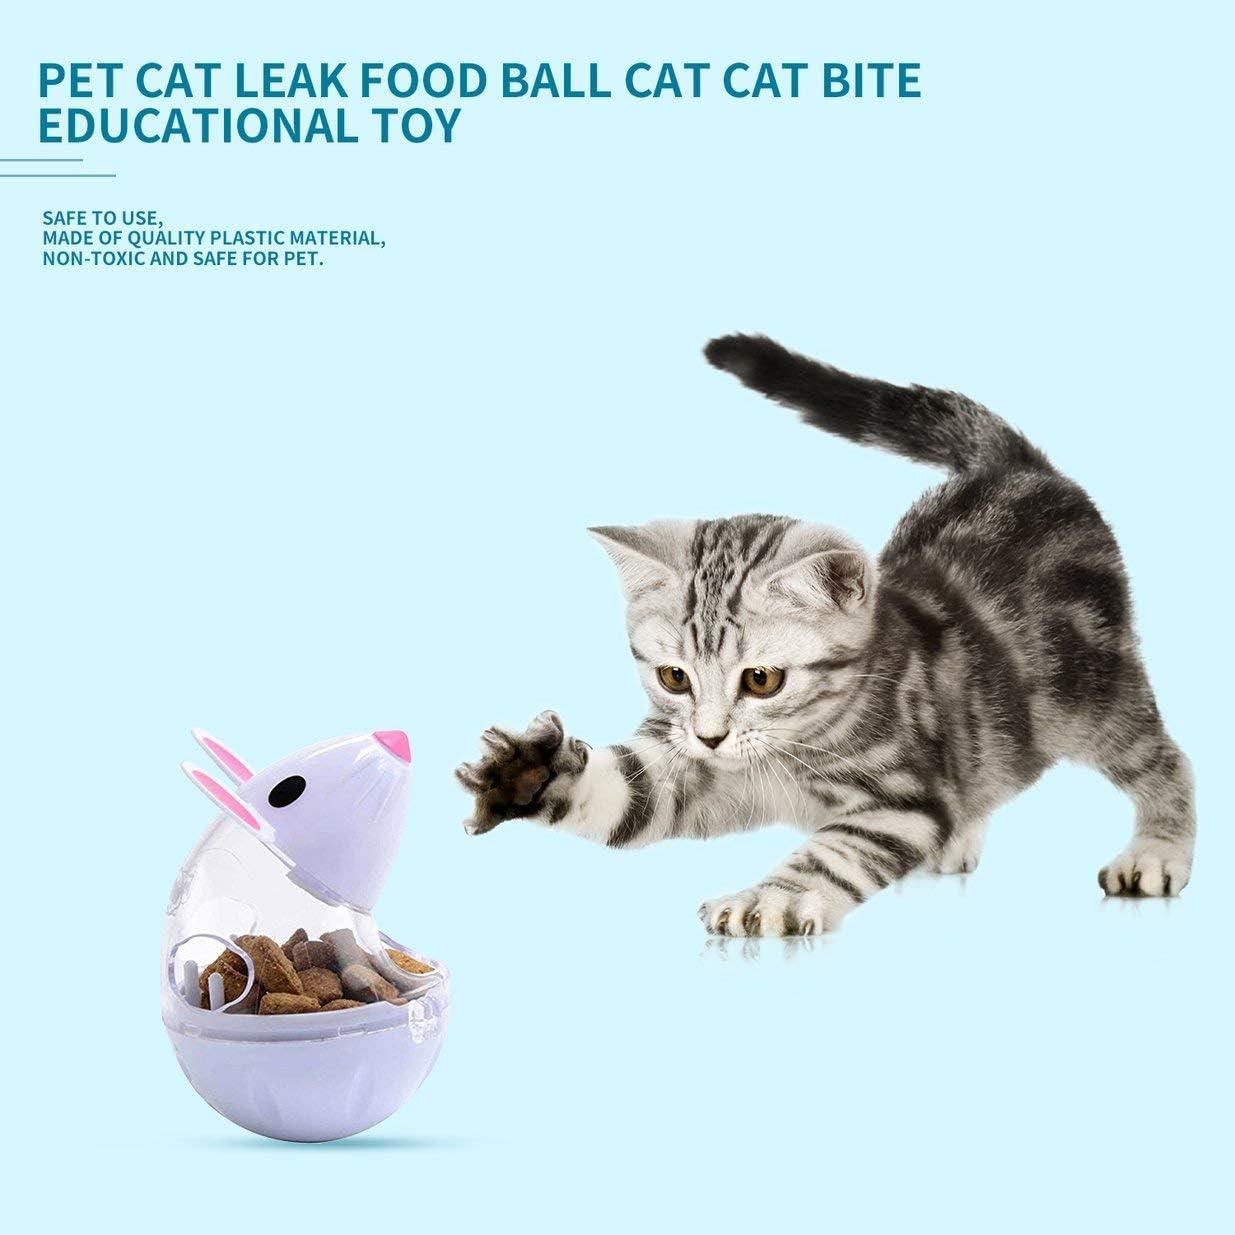 Sairis Pet Cat Alimentador de Fugas para Perros Dispensador de Comida Lenta Ratones Tumbler Design Ball Toy Pet Tumbler Toys Contenedores de Comida Perros Gato